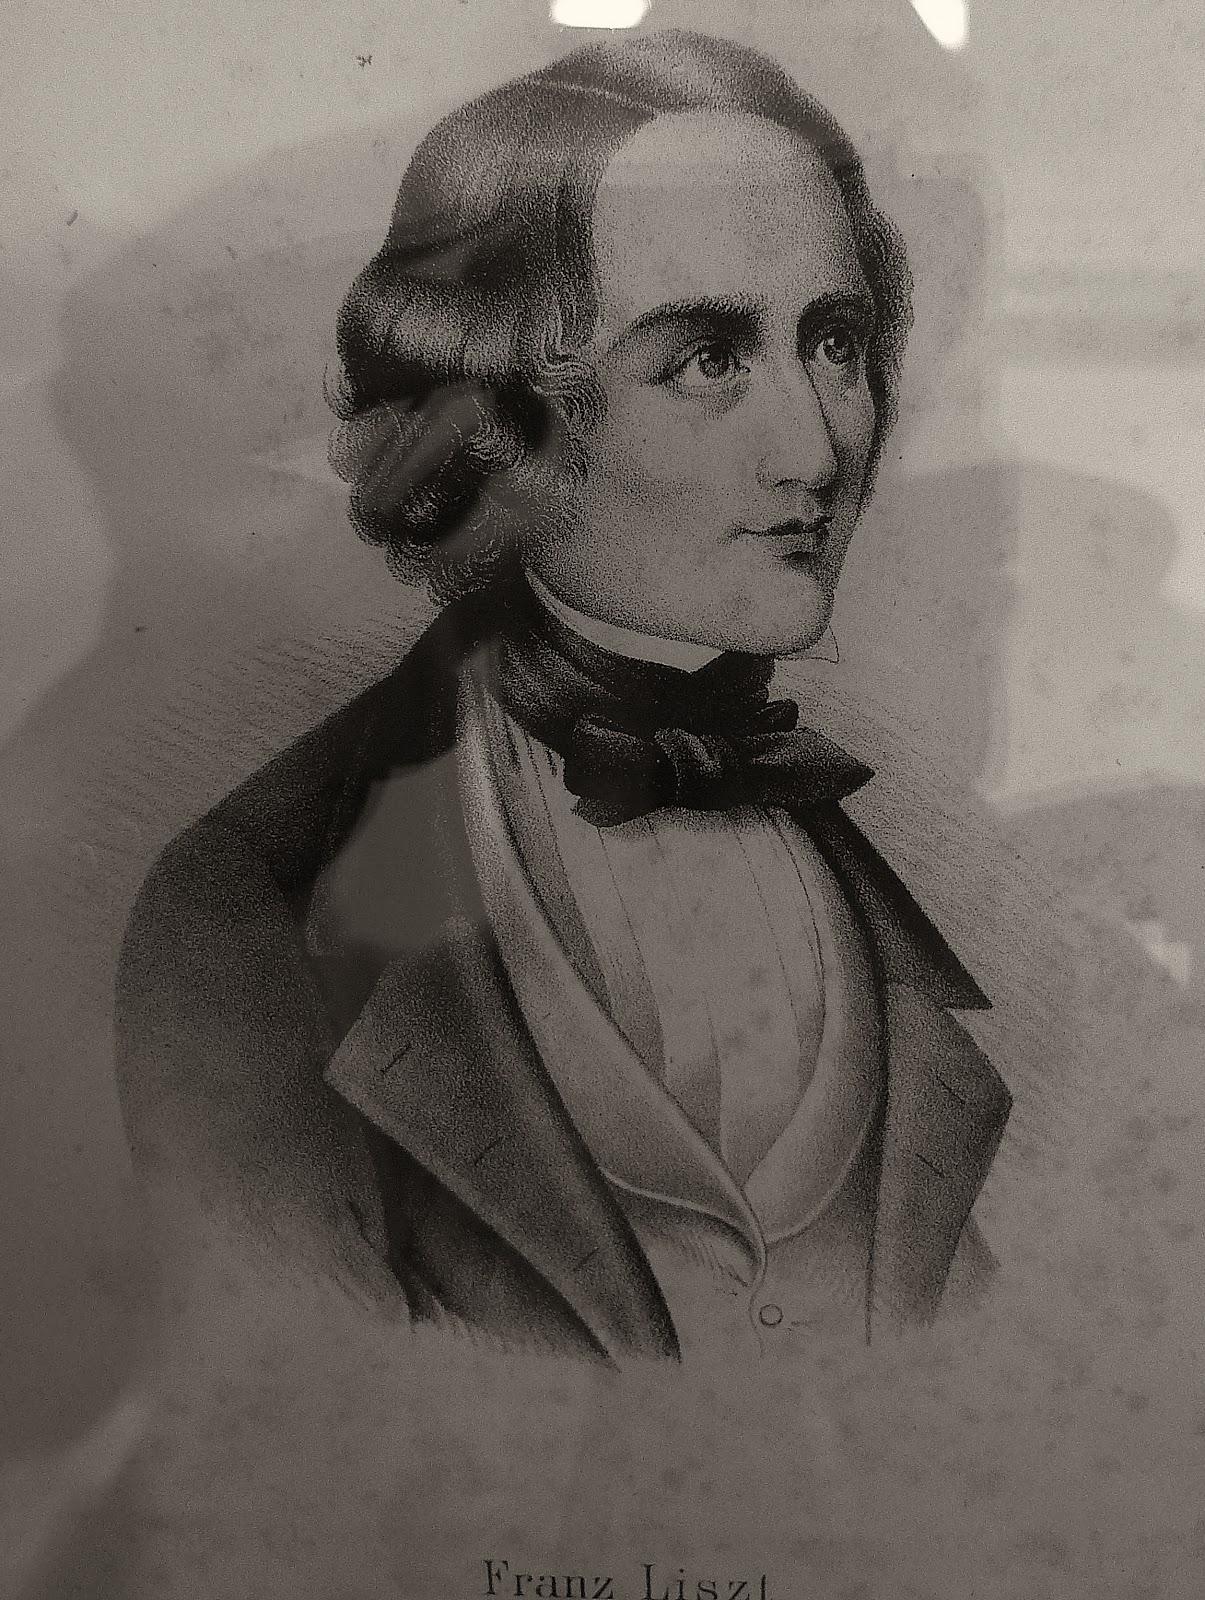 Young Liszt